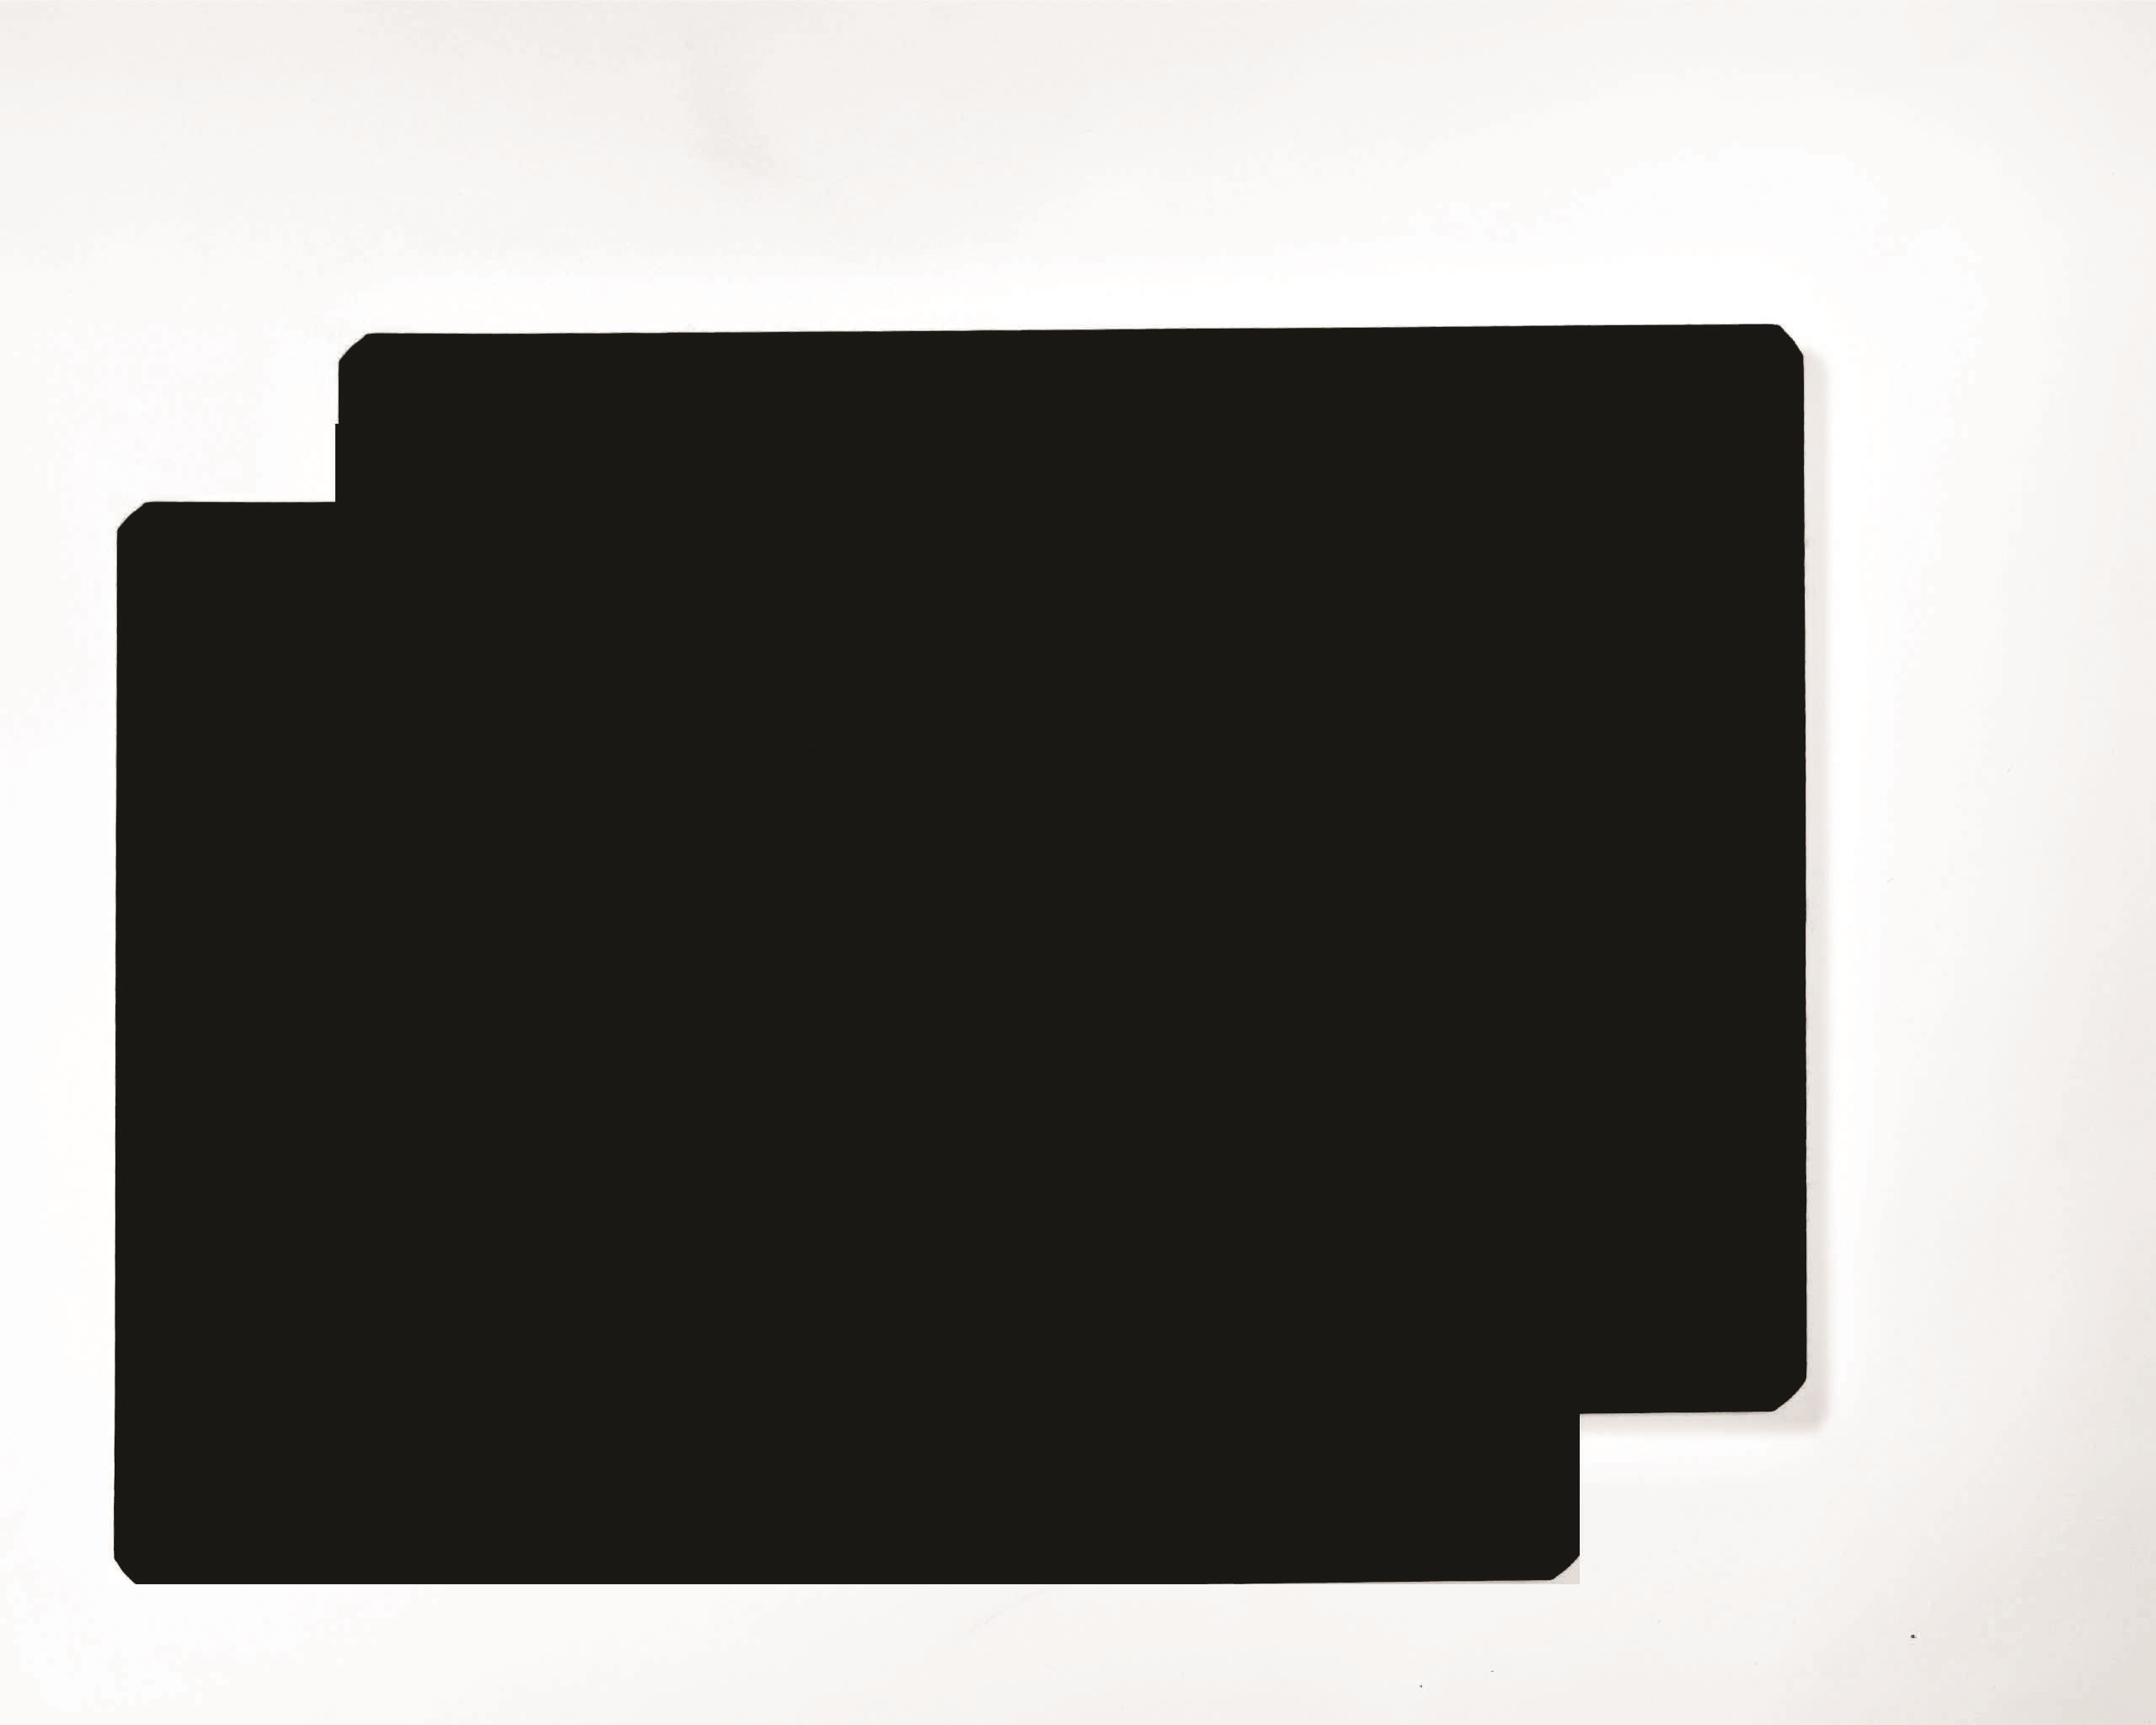 Pack of 12 Black 24mm Magnets